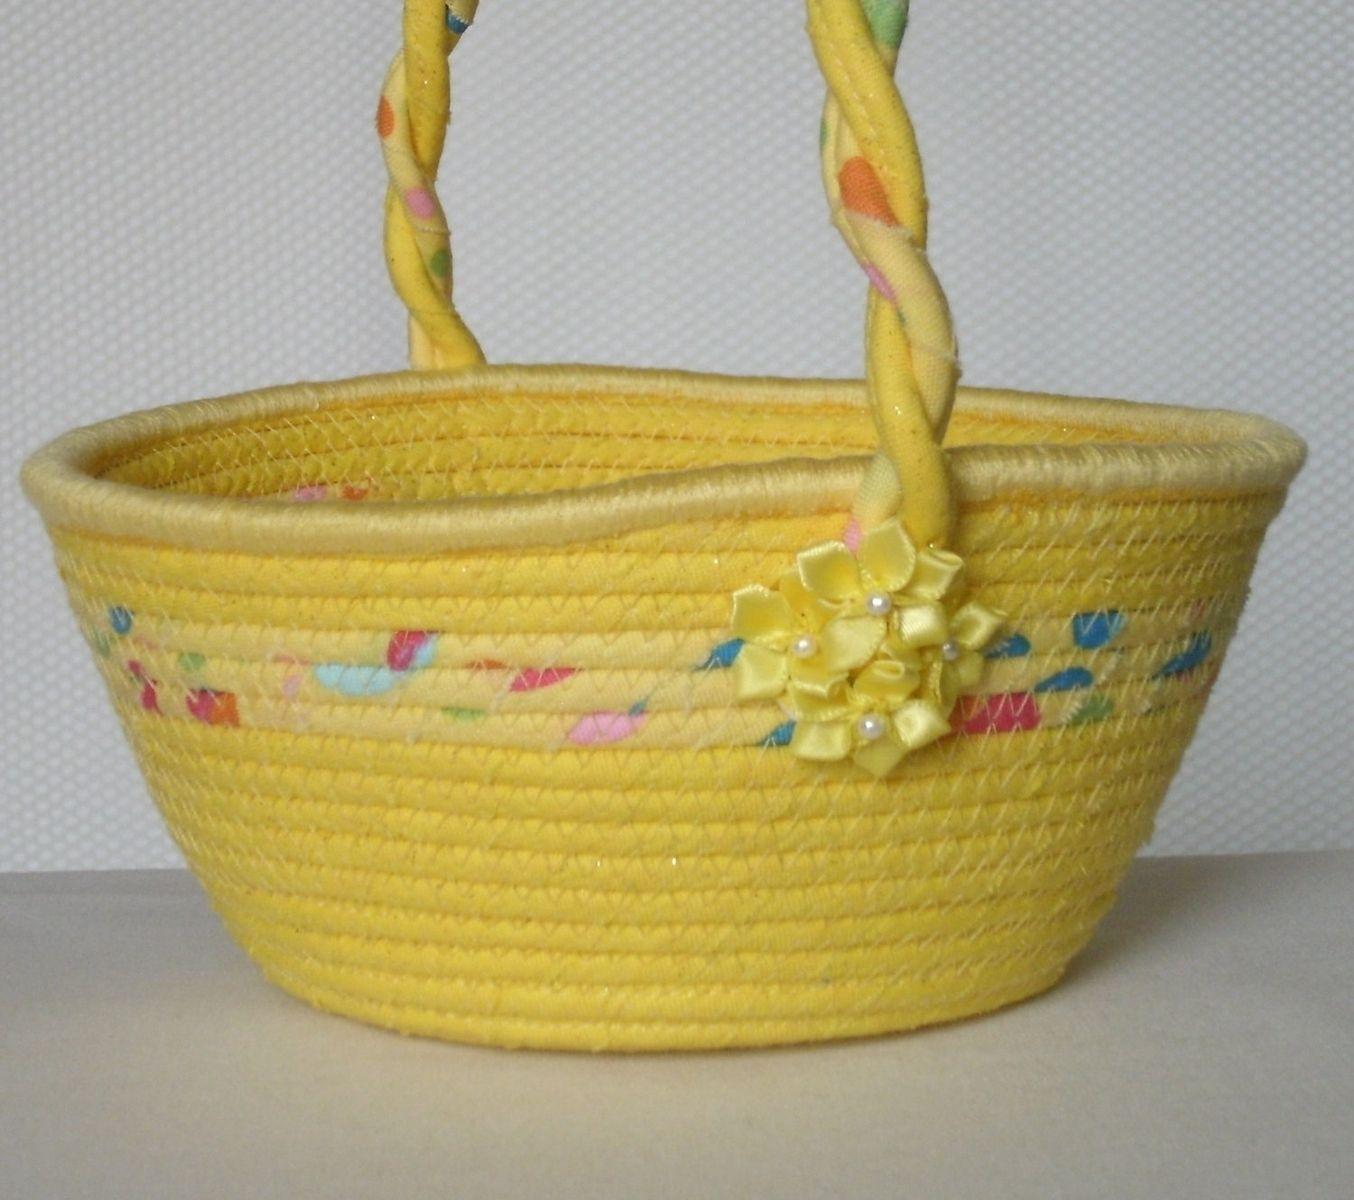 Custom Made Cloth Basket W/Handle - Coiled - Wrapped Clothesline ...